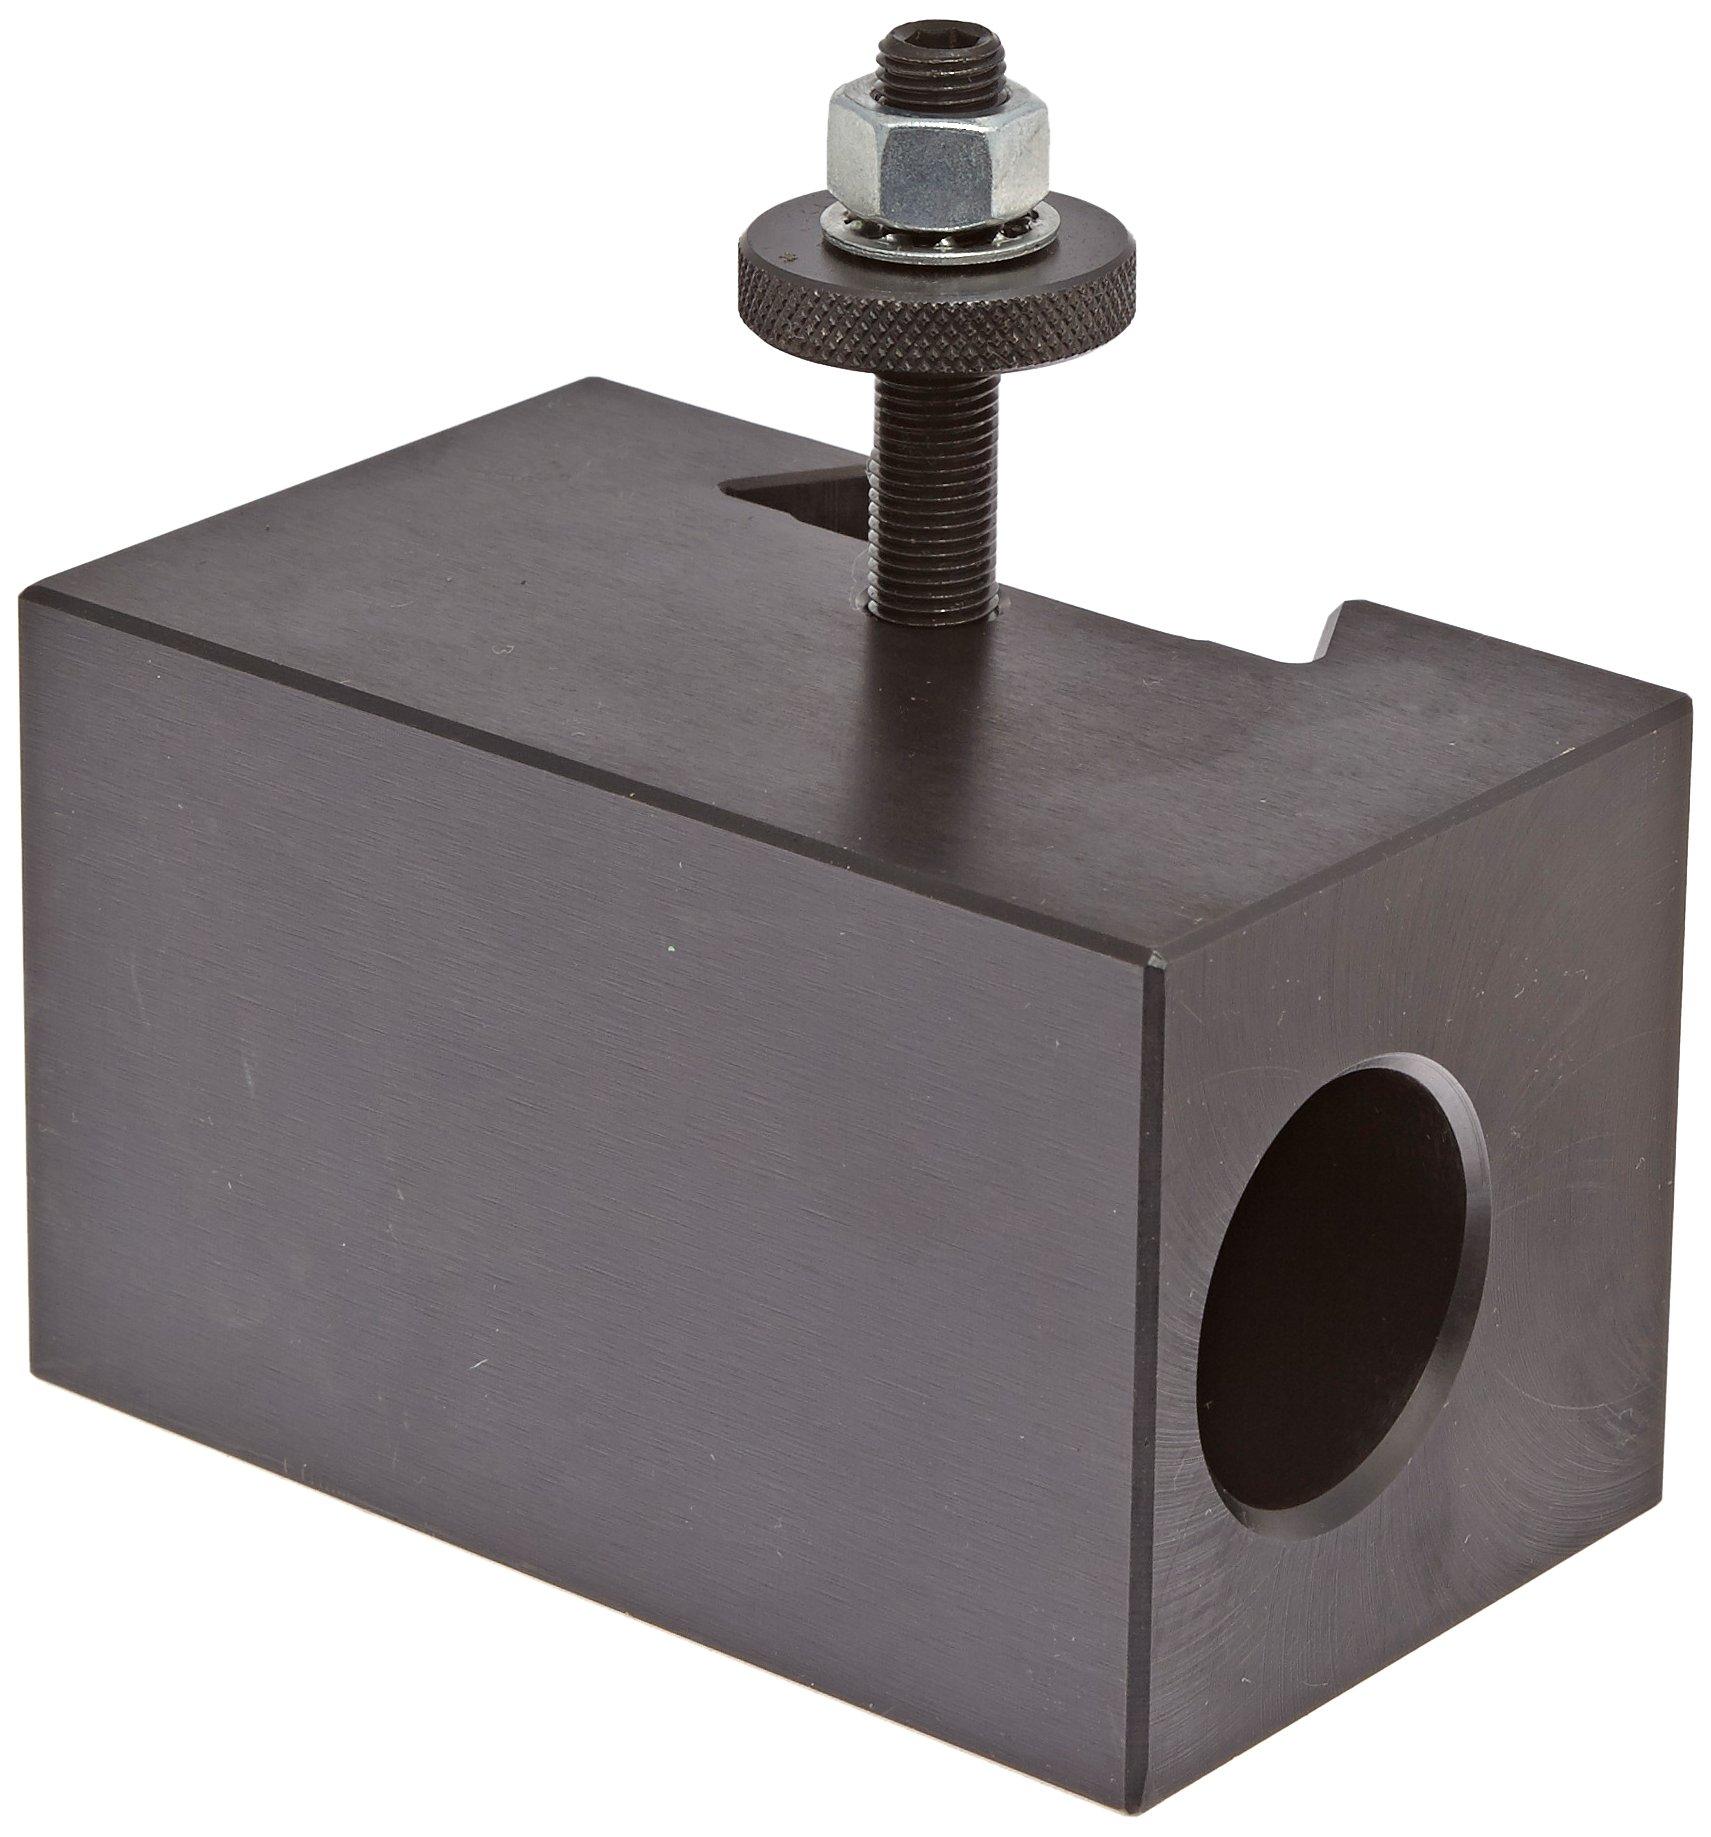 Dorian Tool D5 Chromium Molybdenum Alloy Steel Quick Change Morse Taper Toolholder for SDN35CXA Super Quick Change Tool Post, MT4, 2-1/2'' Height